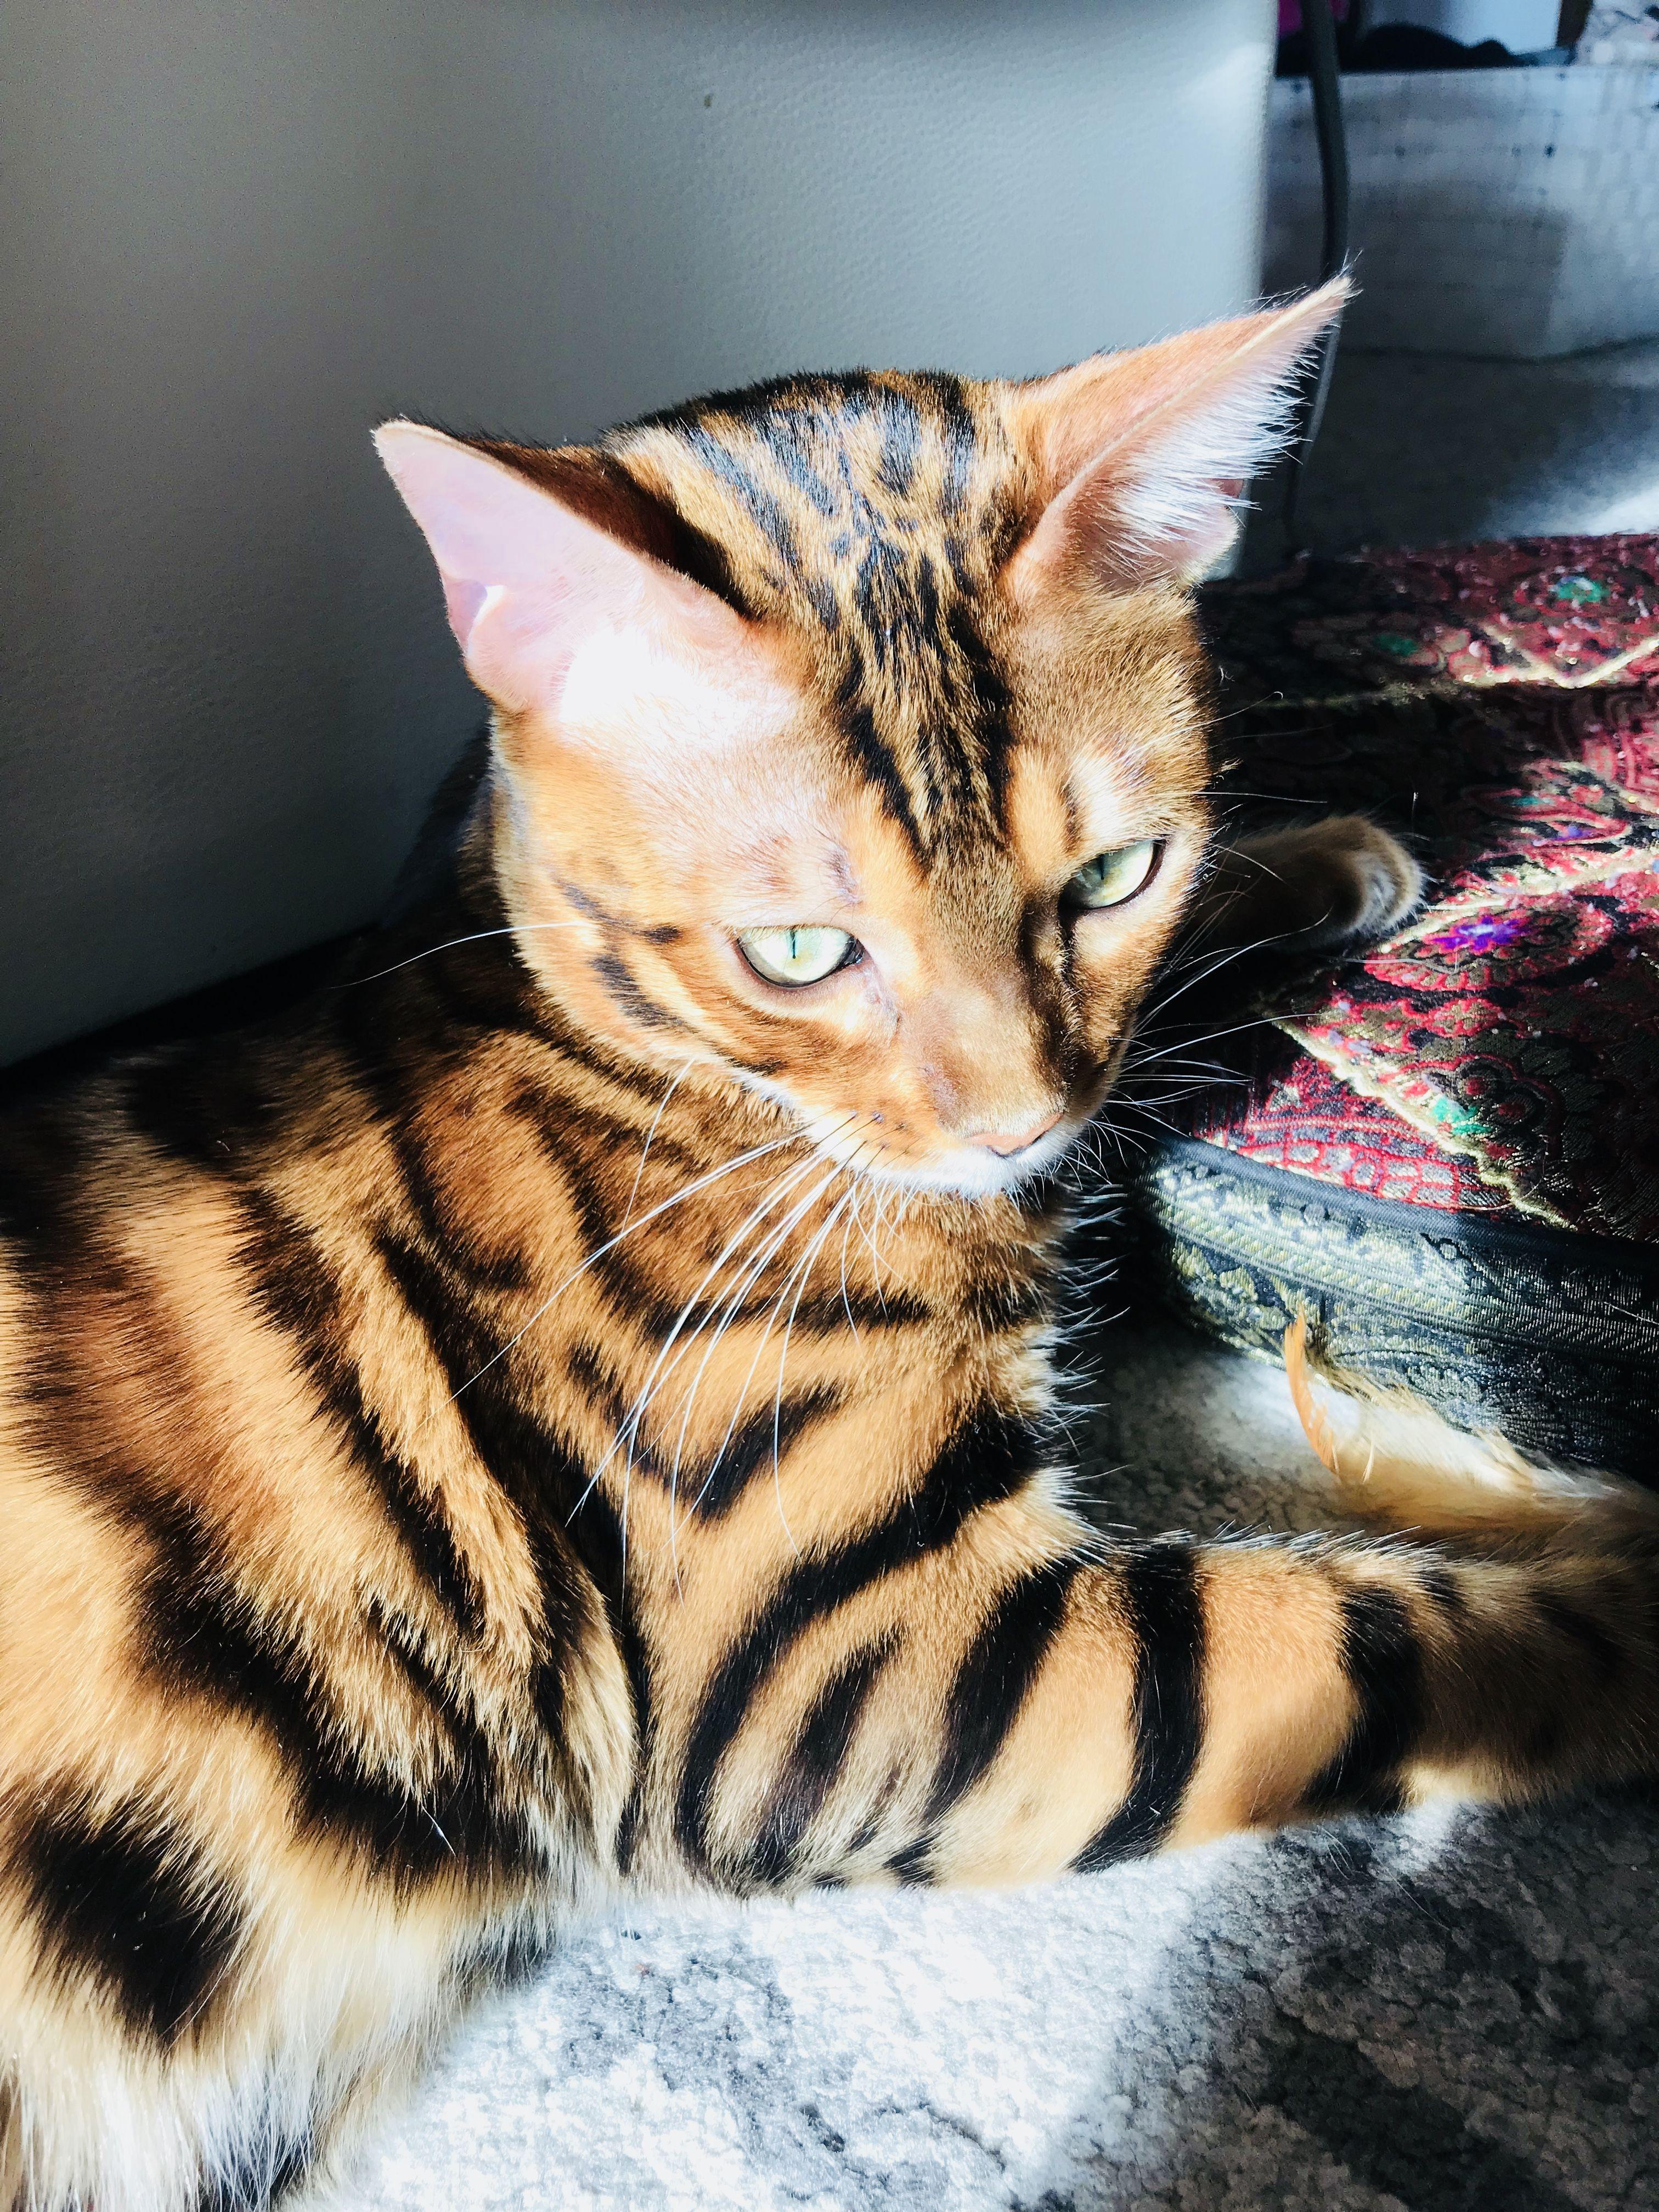 Bengalkatze, Bengalkater, Timur, Bengal Cat Bengal cat